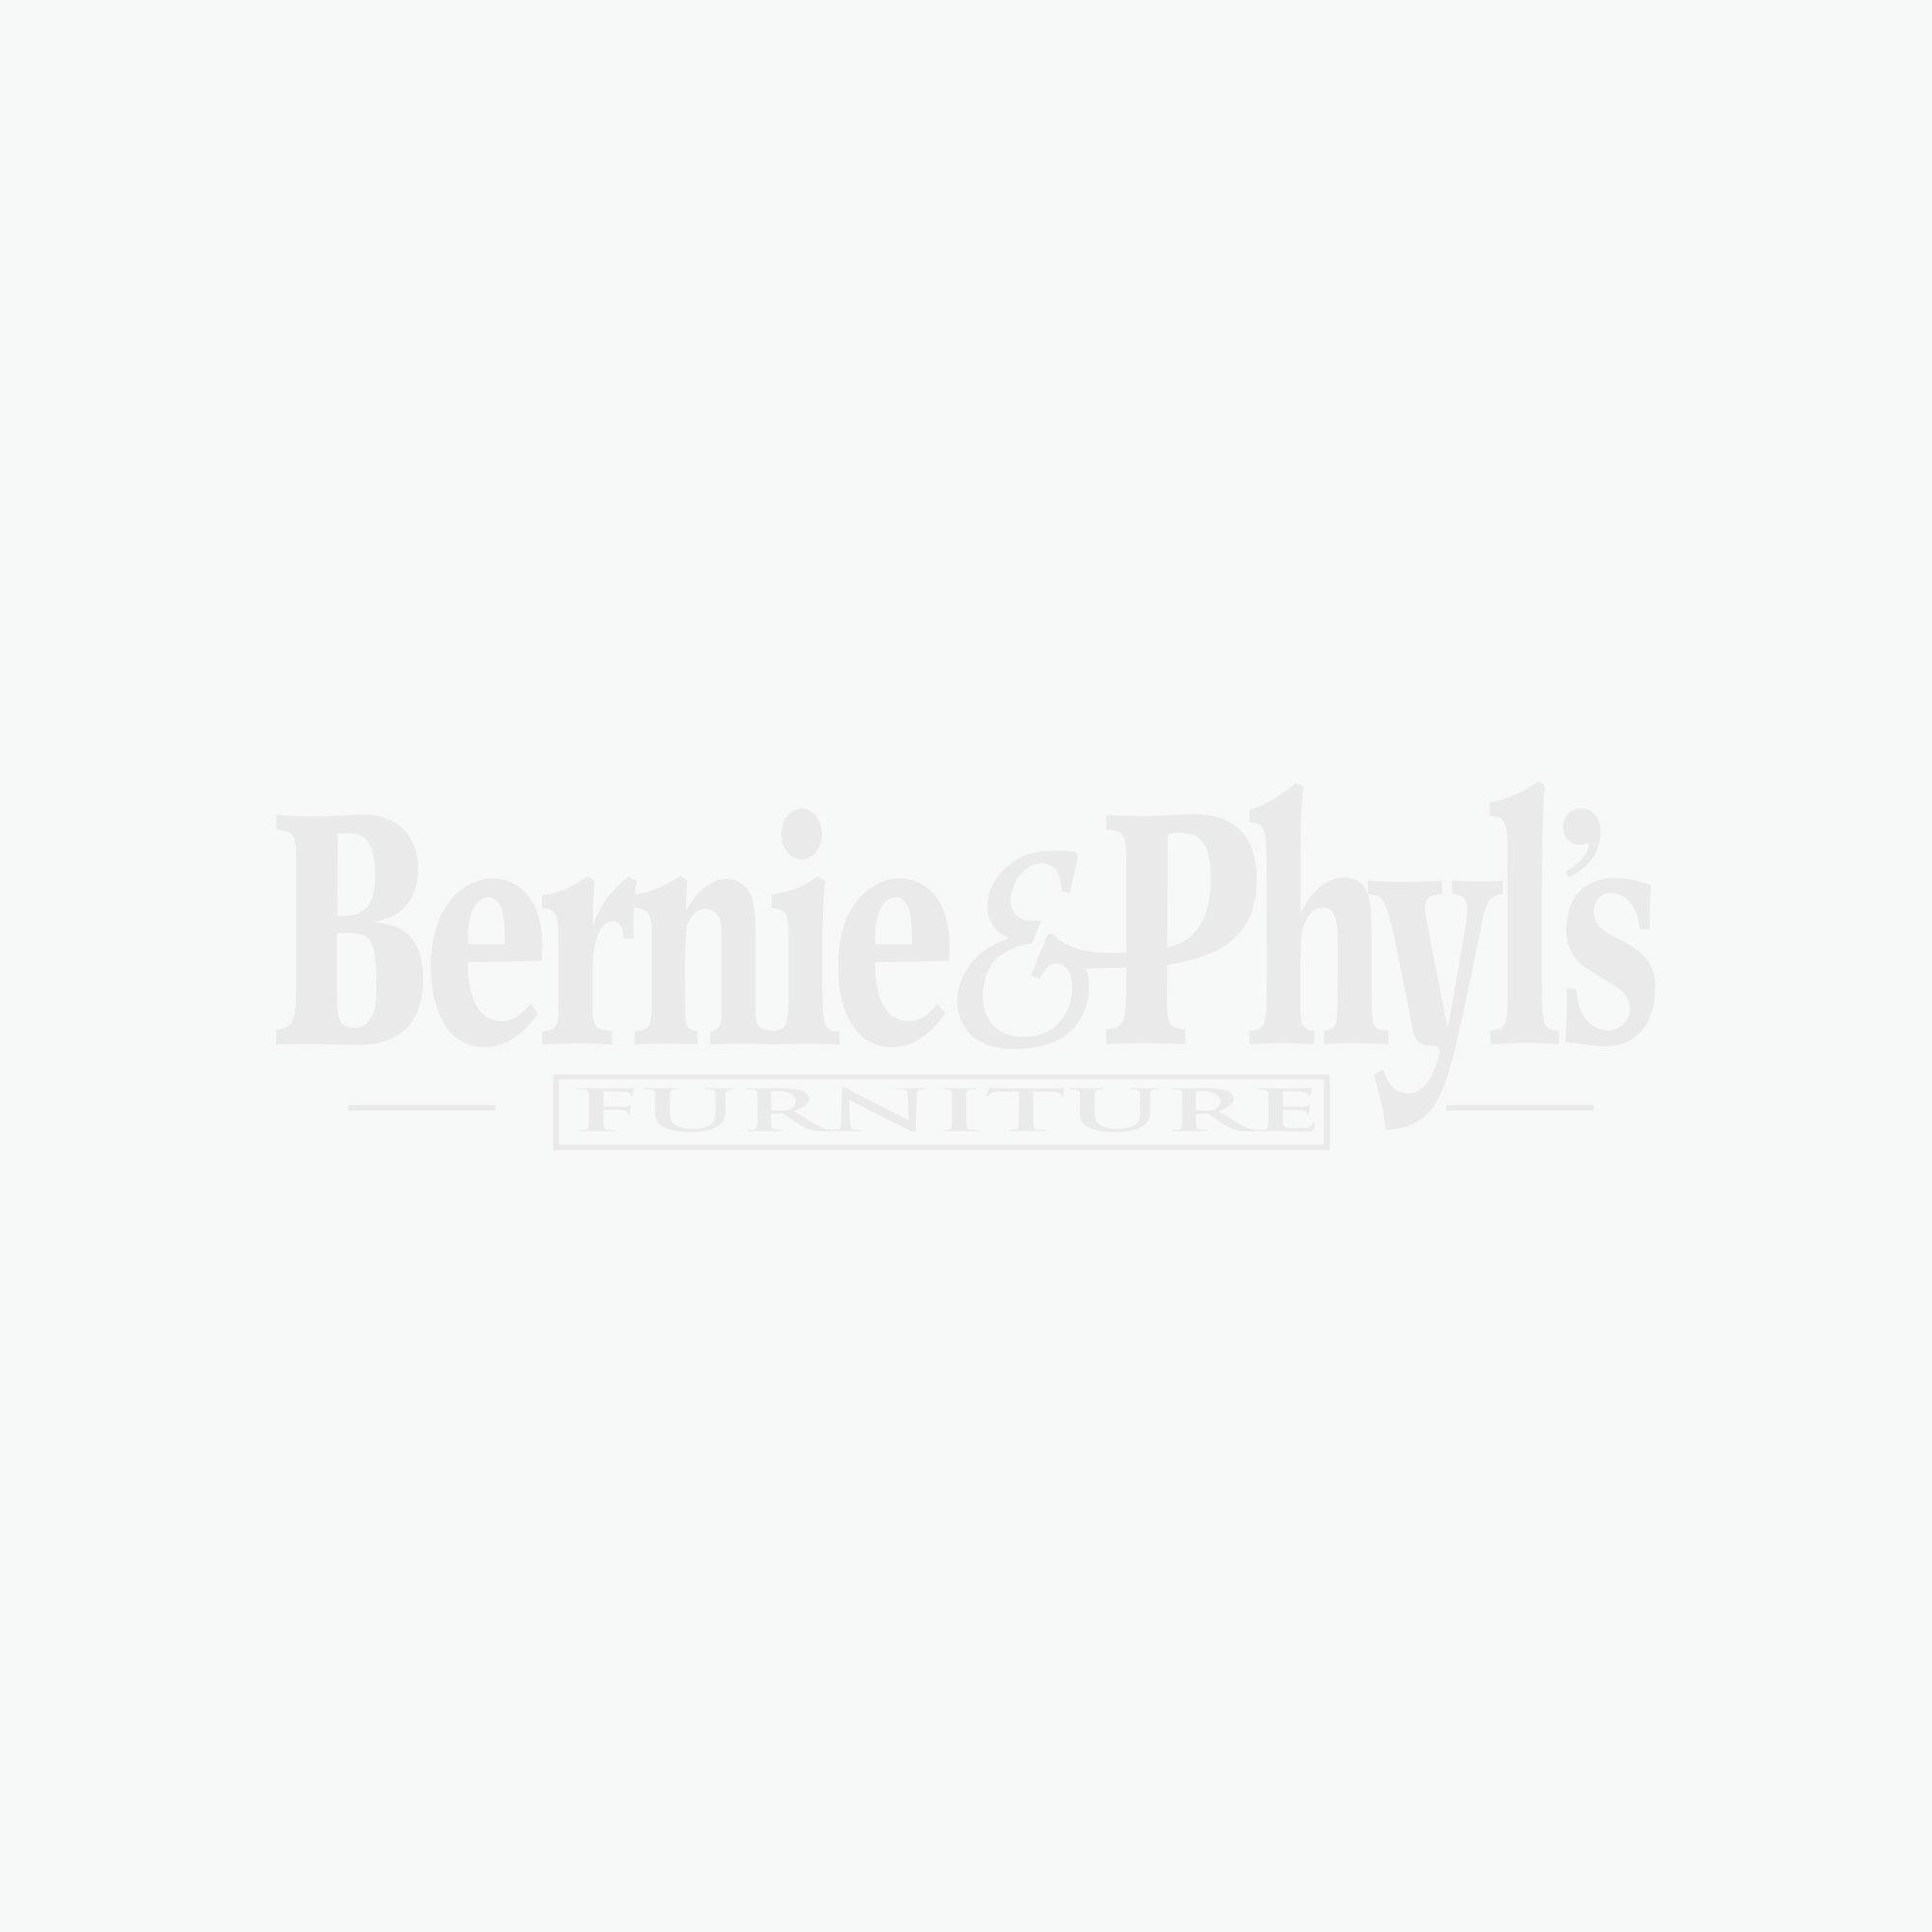 Dynasty Media Cabinet - Espresso - (Set of 1) - MS9865 - by Southern Enterprises